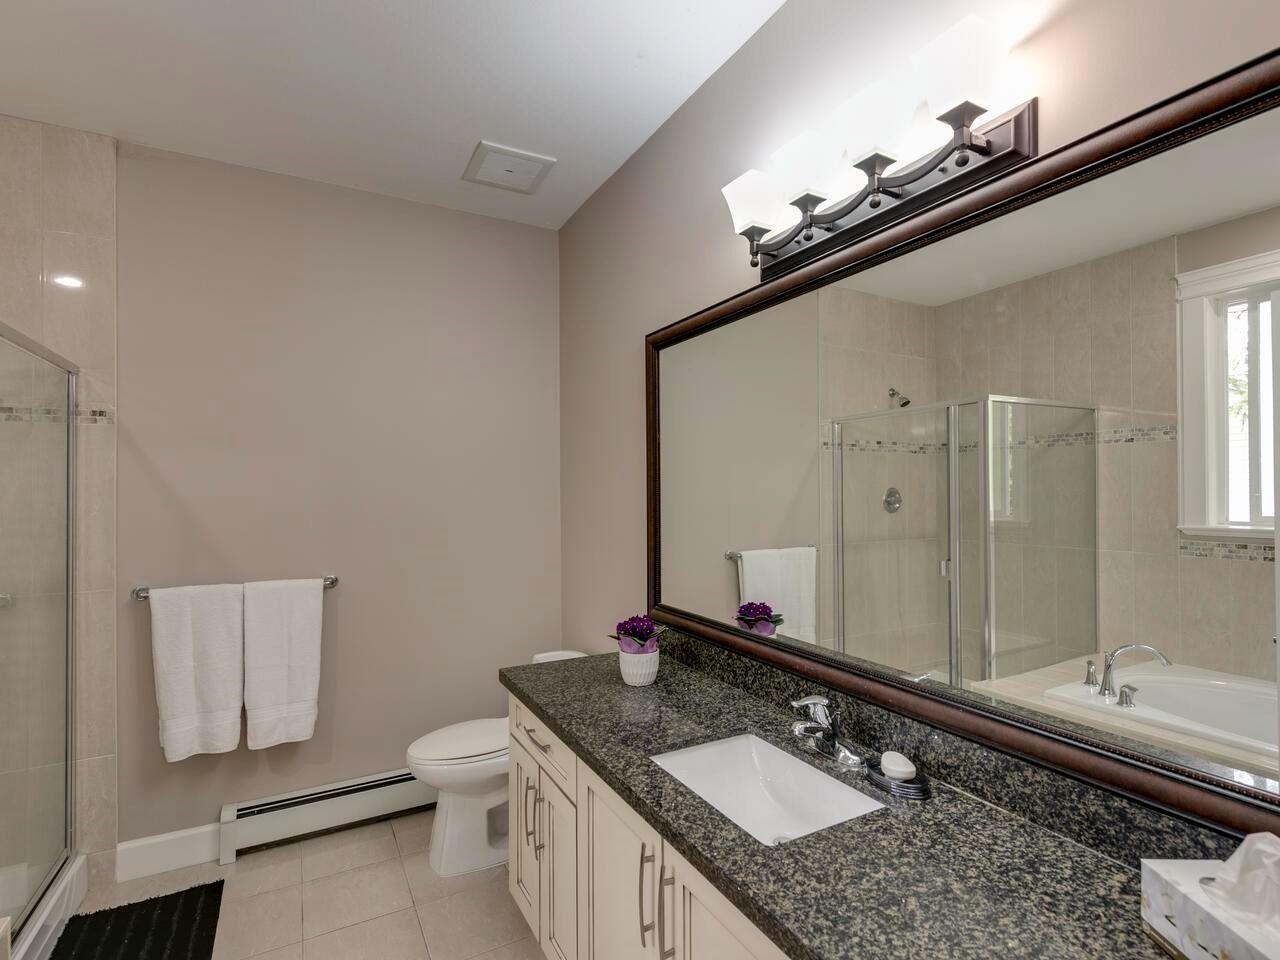 "Photo 19: Photos: 22845 126B Avenue in Maple Ridge: East Central House for sale in ""EAST CENTRAL MAPLE RIDGE"" : MLS®# R2594638"